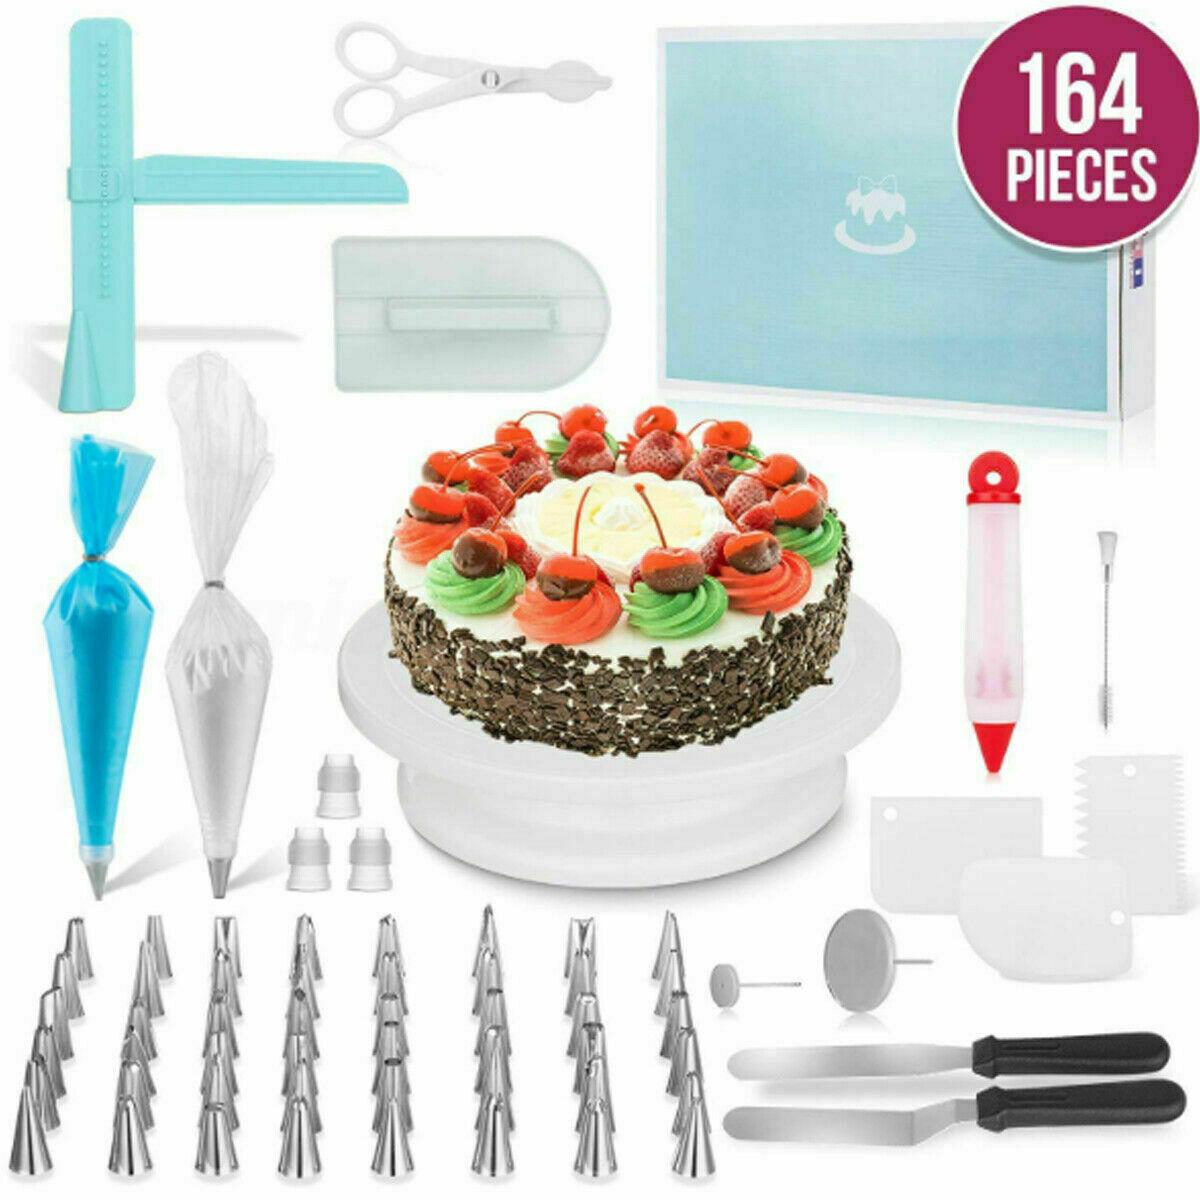 164 pcs Icing Piping Nozzles Pastry Tips Cake Sugarcraft Decorating Tools Set Baking Accs. & Cake Decorating